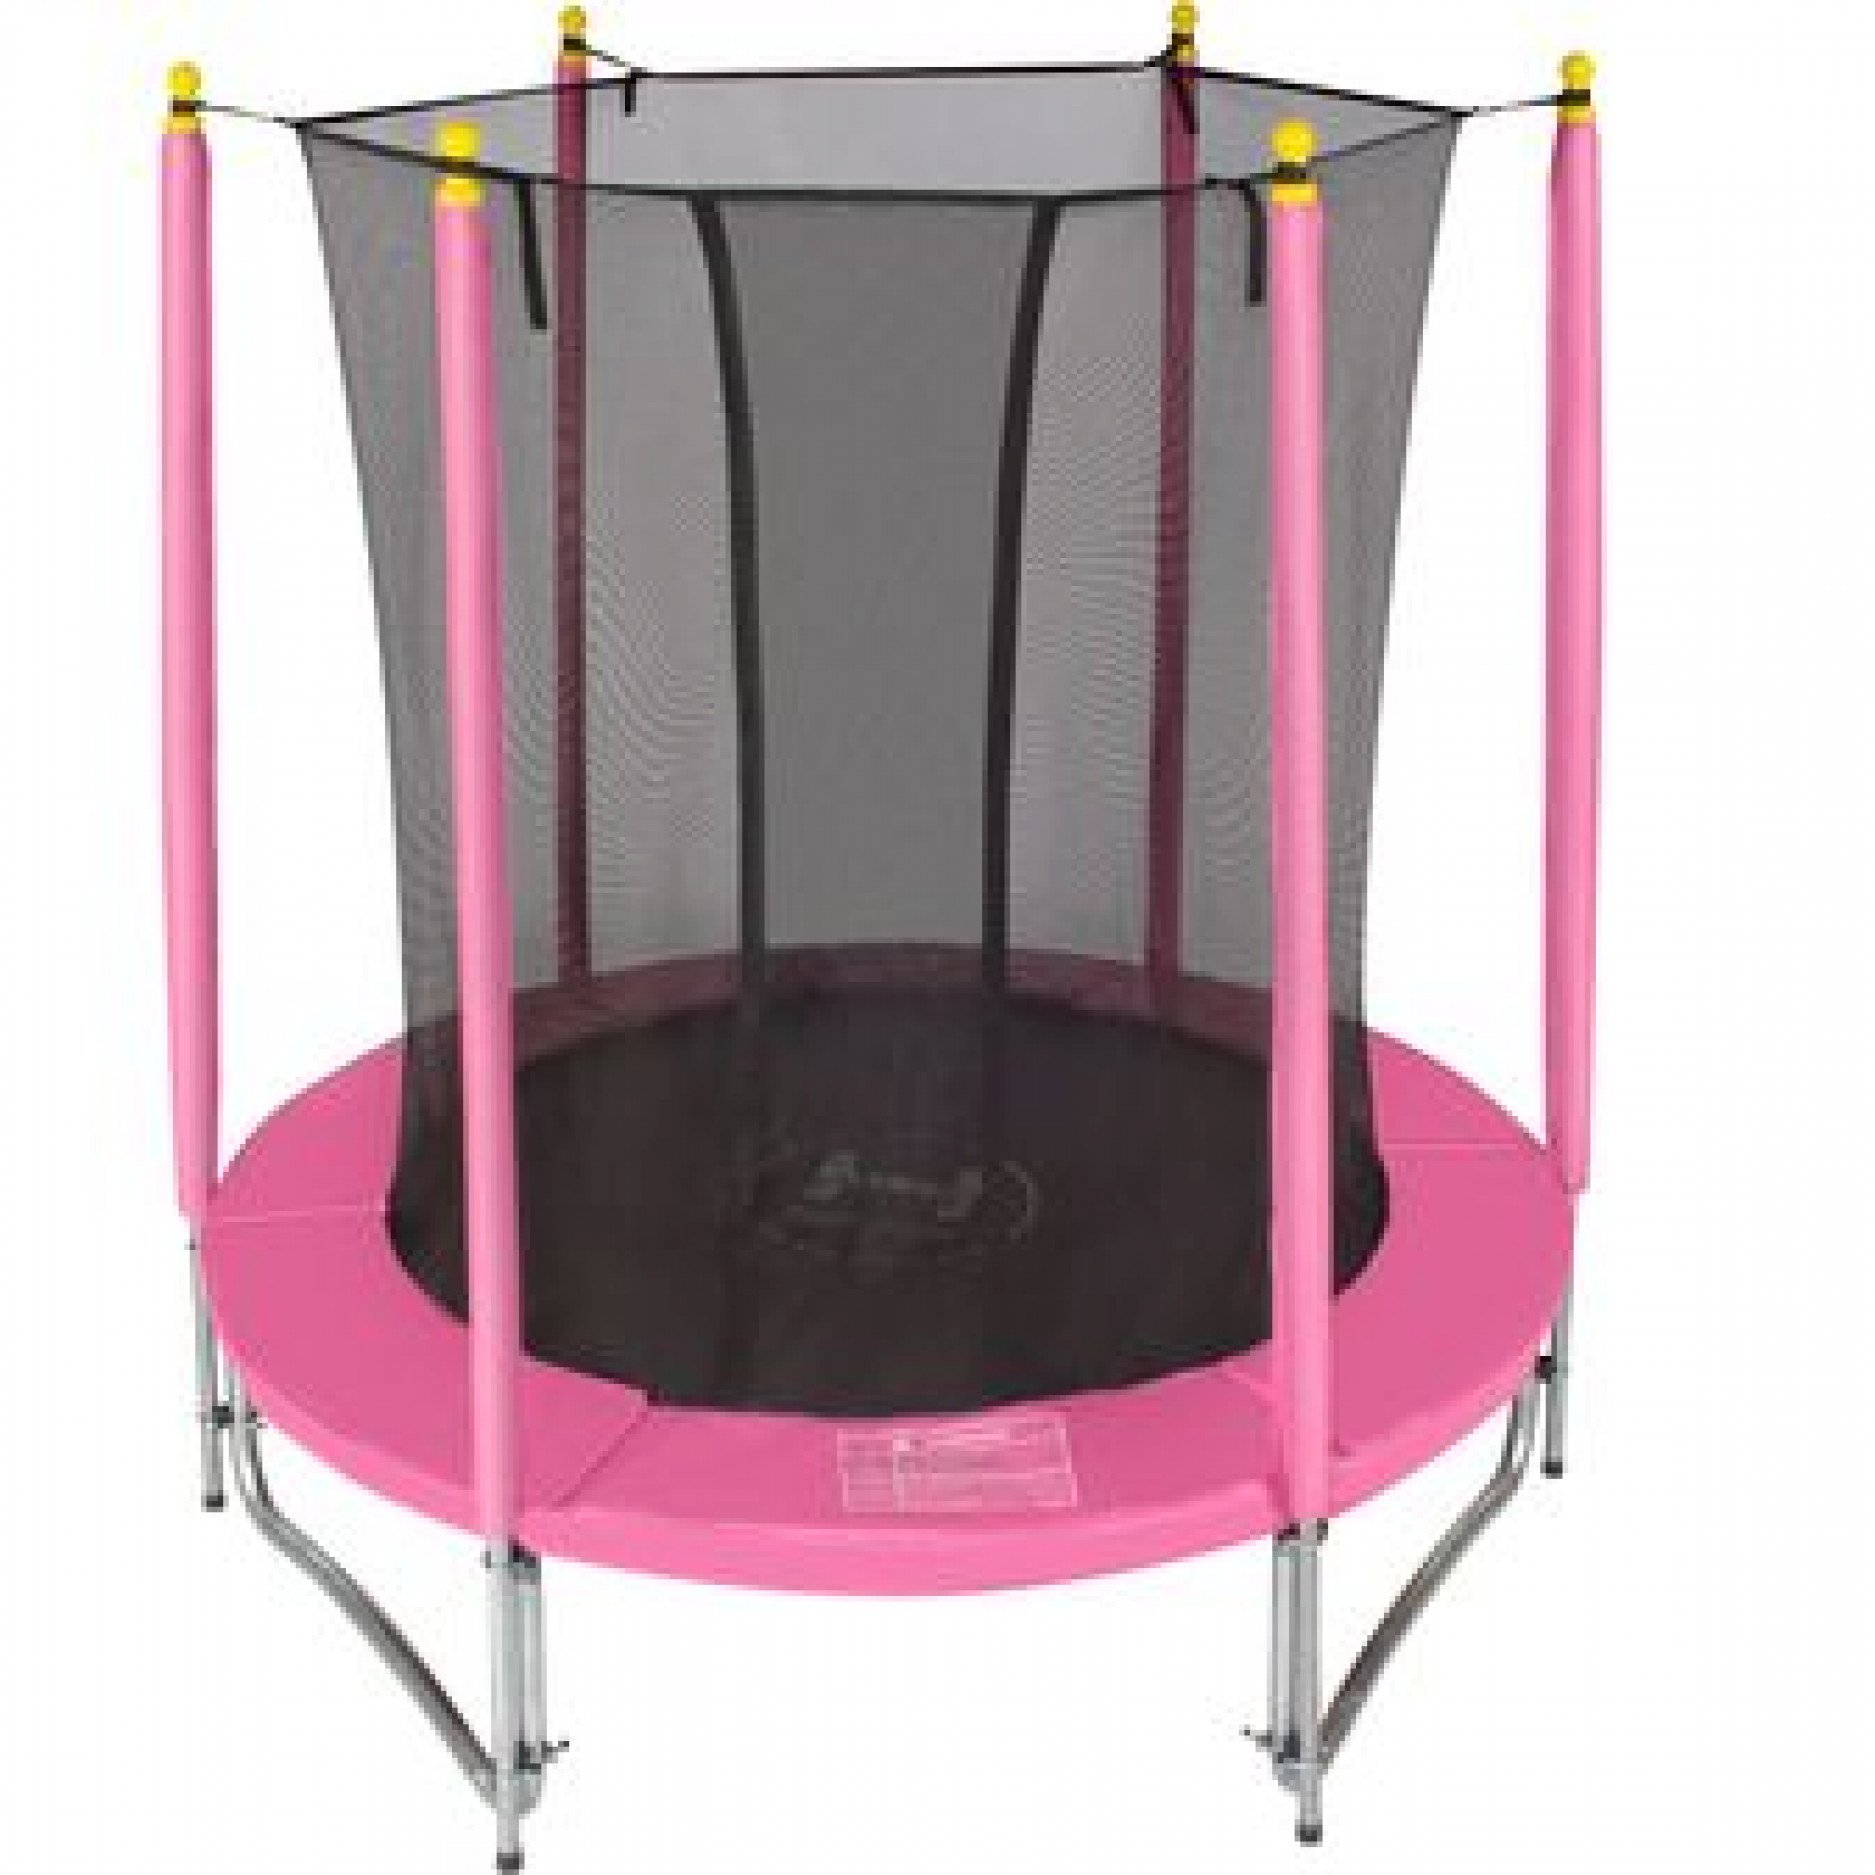 Батут Hasttings Classic pink 6ft (1.82 м) с внутренней сеткой